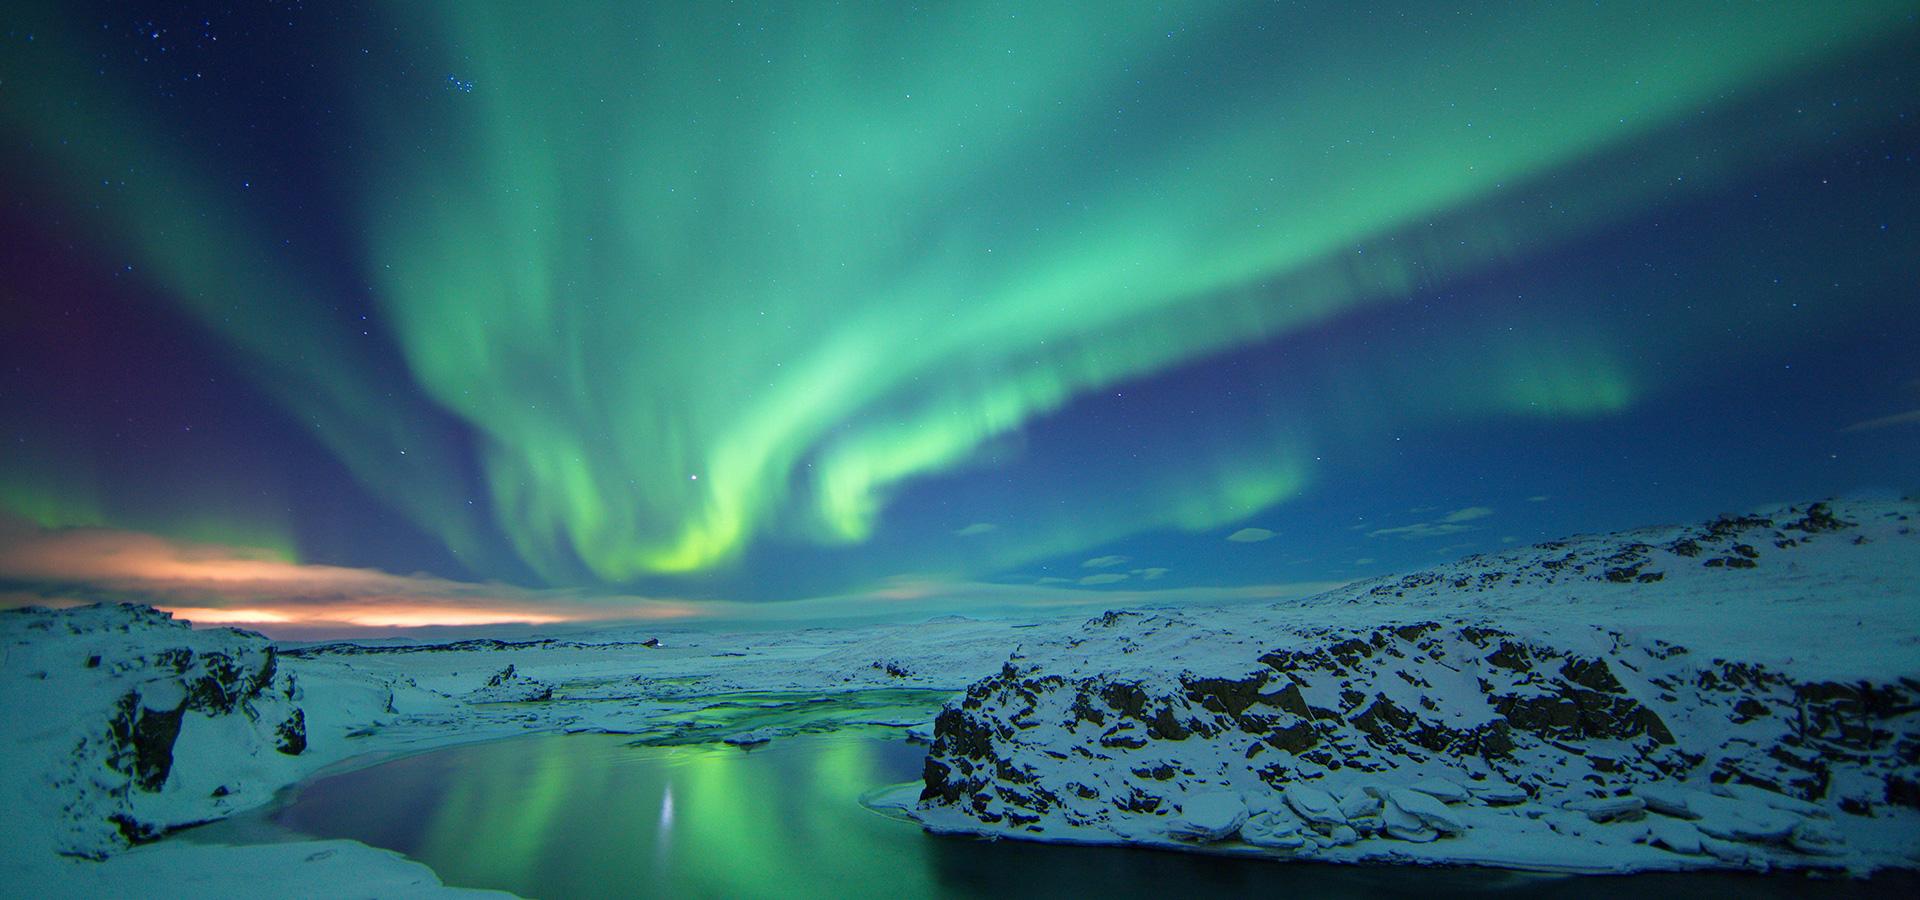 an-evening-of-northern-lights-at-laugarvatn-fontana-4.jpg